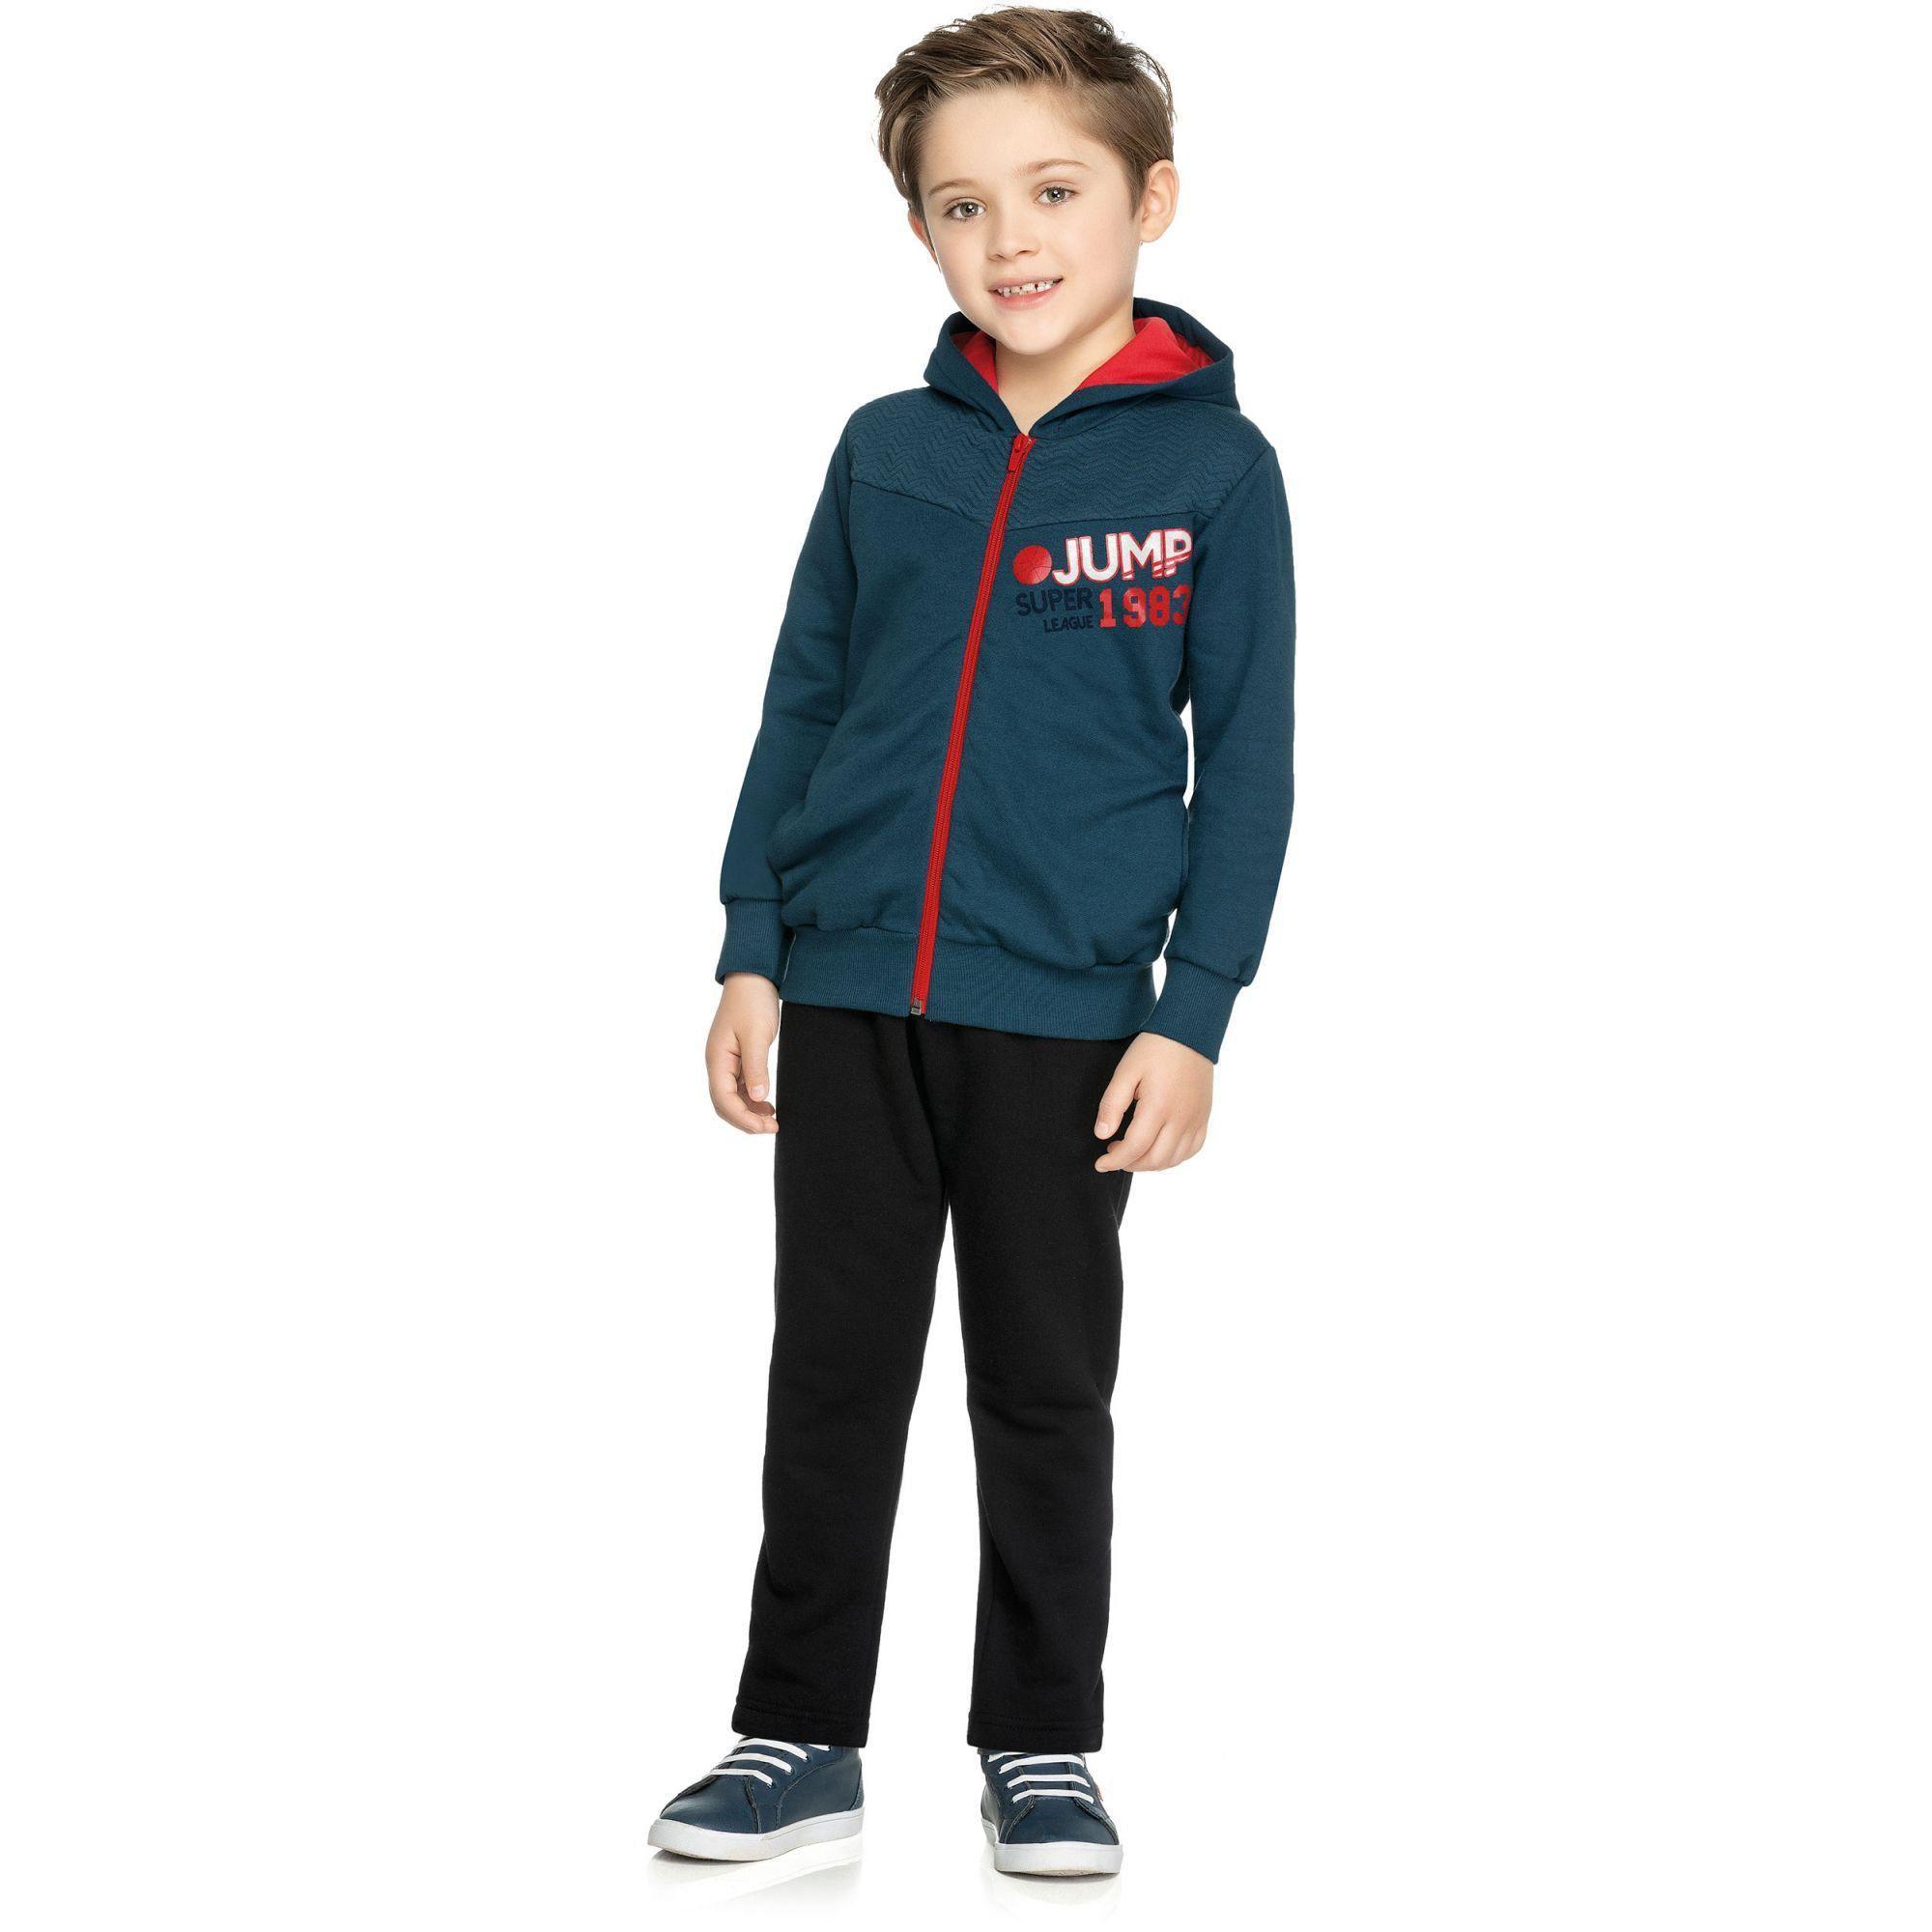 Conjunto Infantil Masculino Inverno Marinho Jump Elian